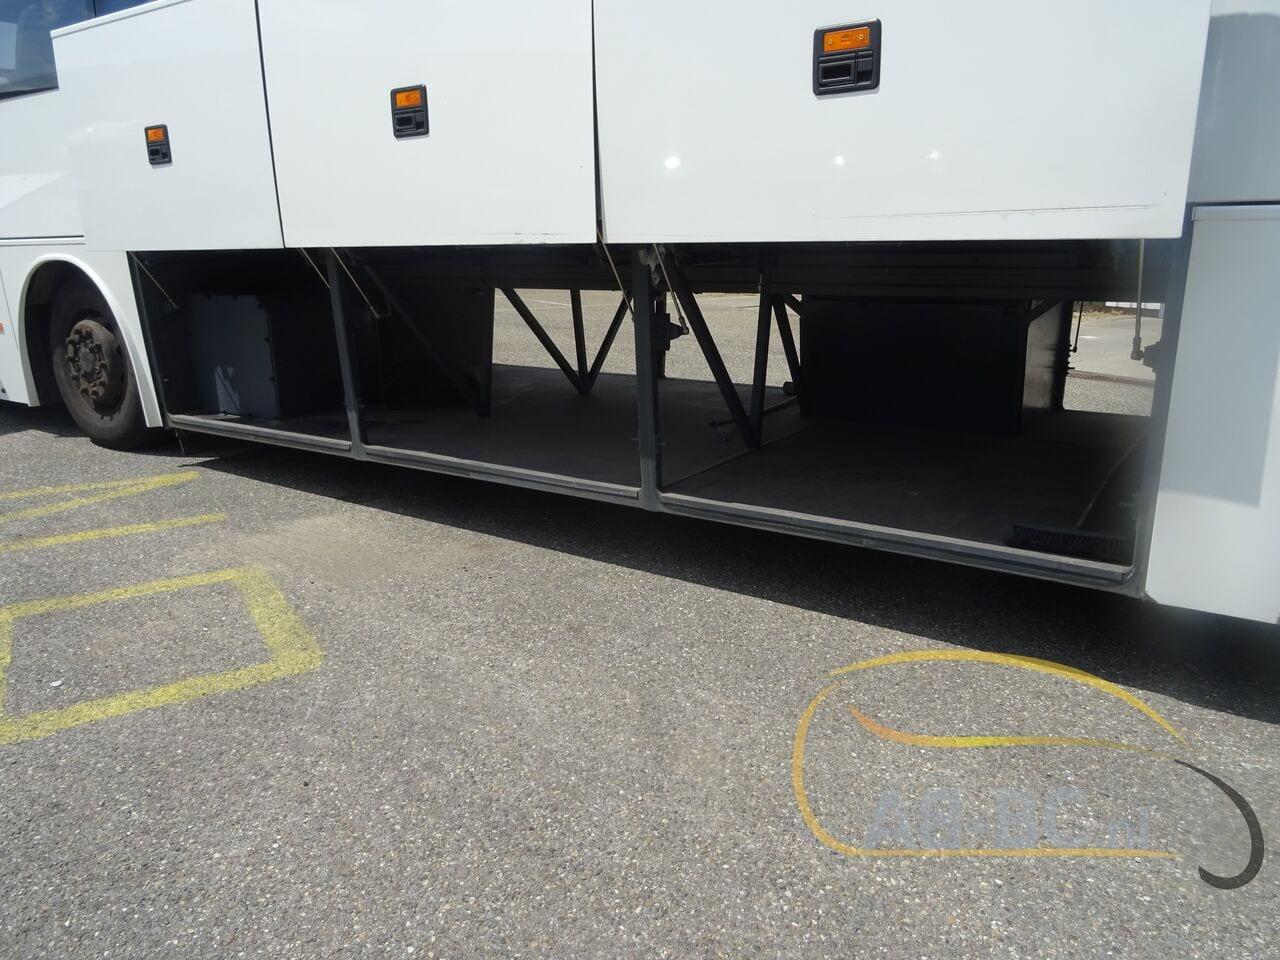 coach-busTEMSA-Safari-RD-DAF-Motor-53-Seats-Euro-5---1623932666577692375_big_2c5bb48972bba14c3ae86fb7cca65bce--21061715155620919600